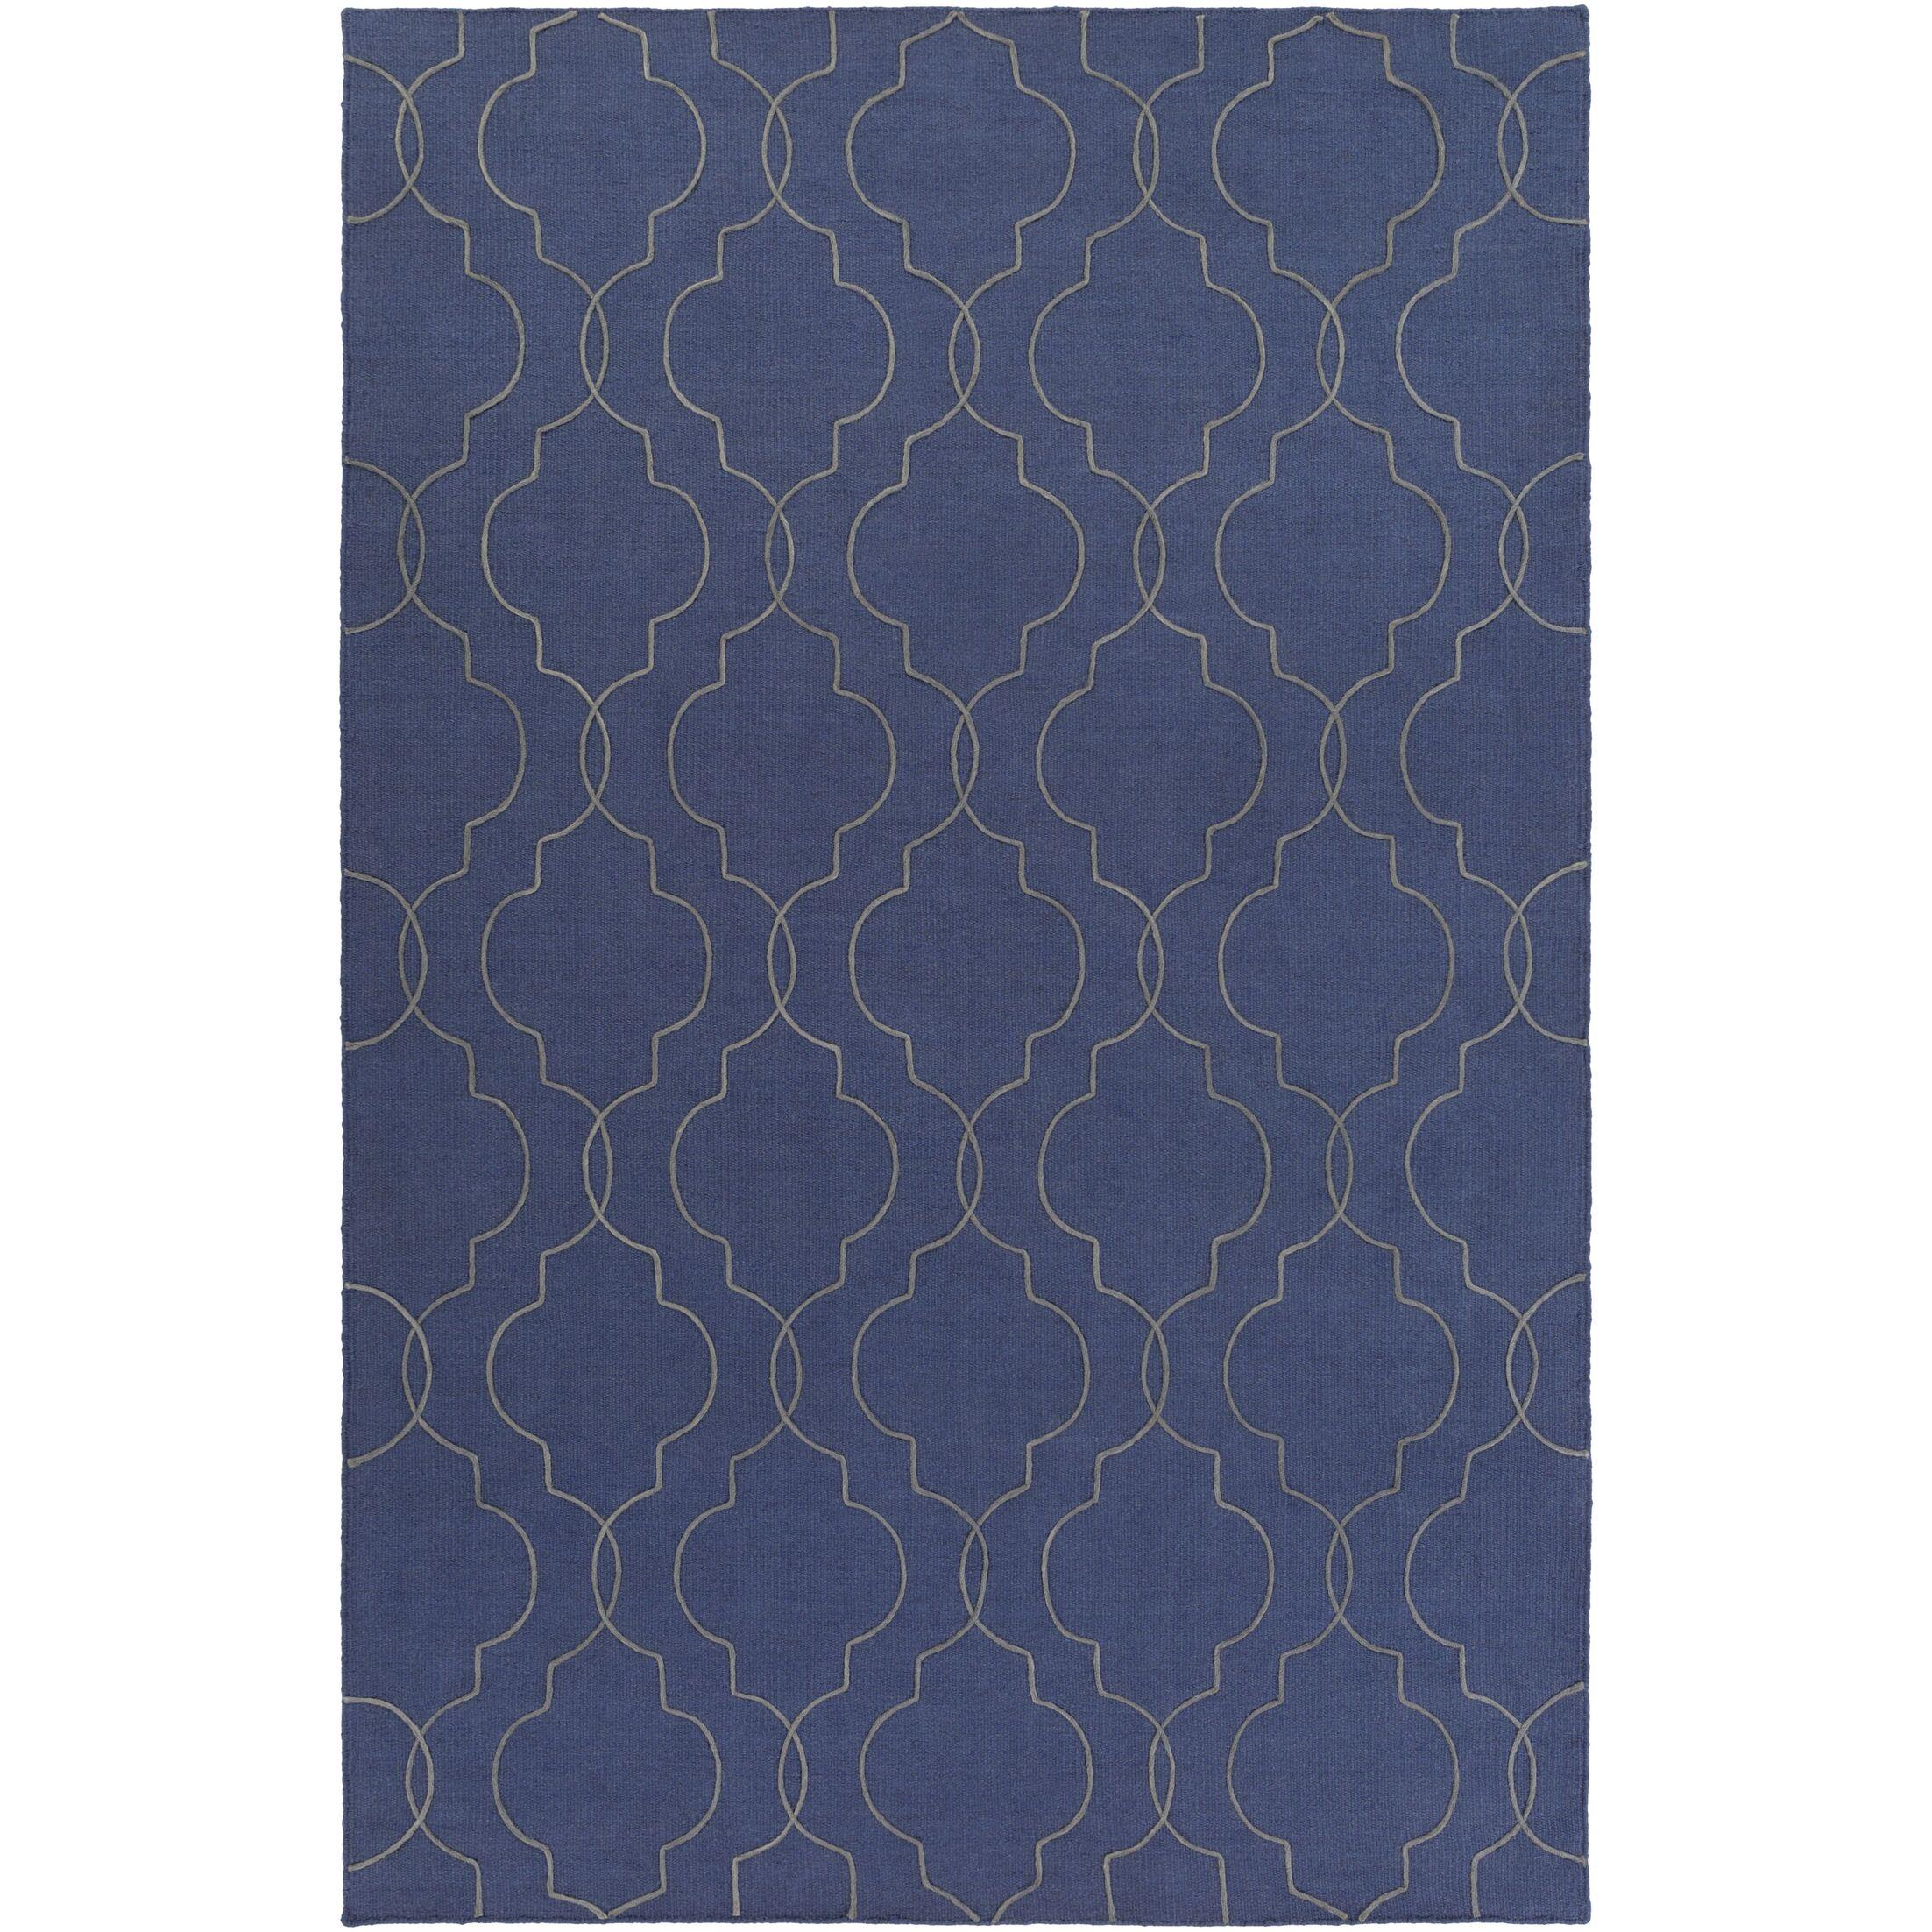 Amenia Hand-Woven Dark Blue Area Rug Rug Size: Rectangle 5' x 7'6